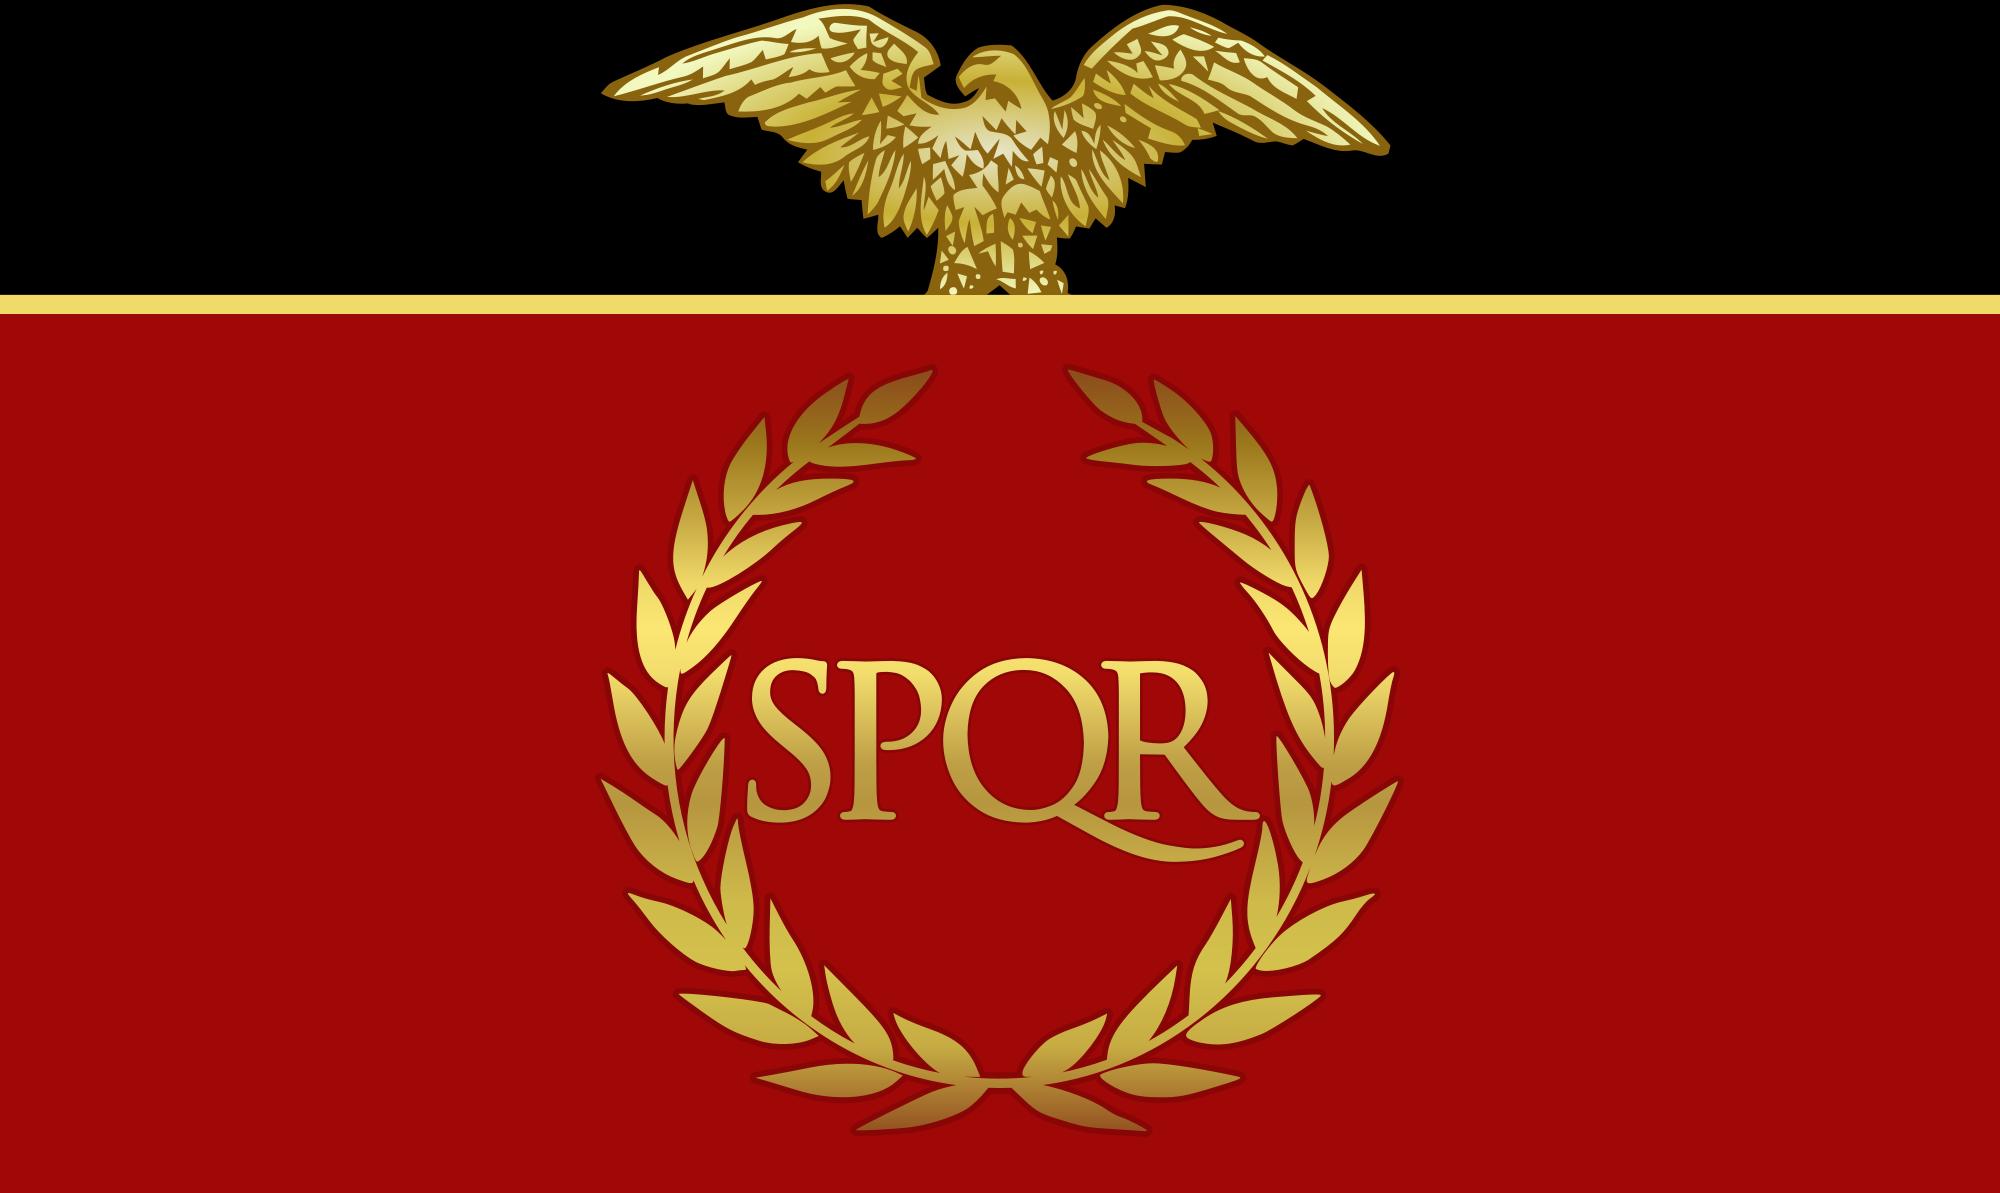 Image Rome Flag Spqr Png Alternative History Fandom